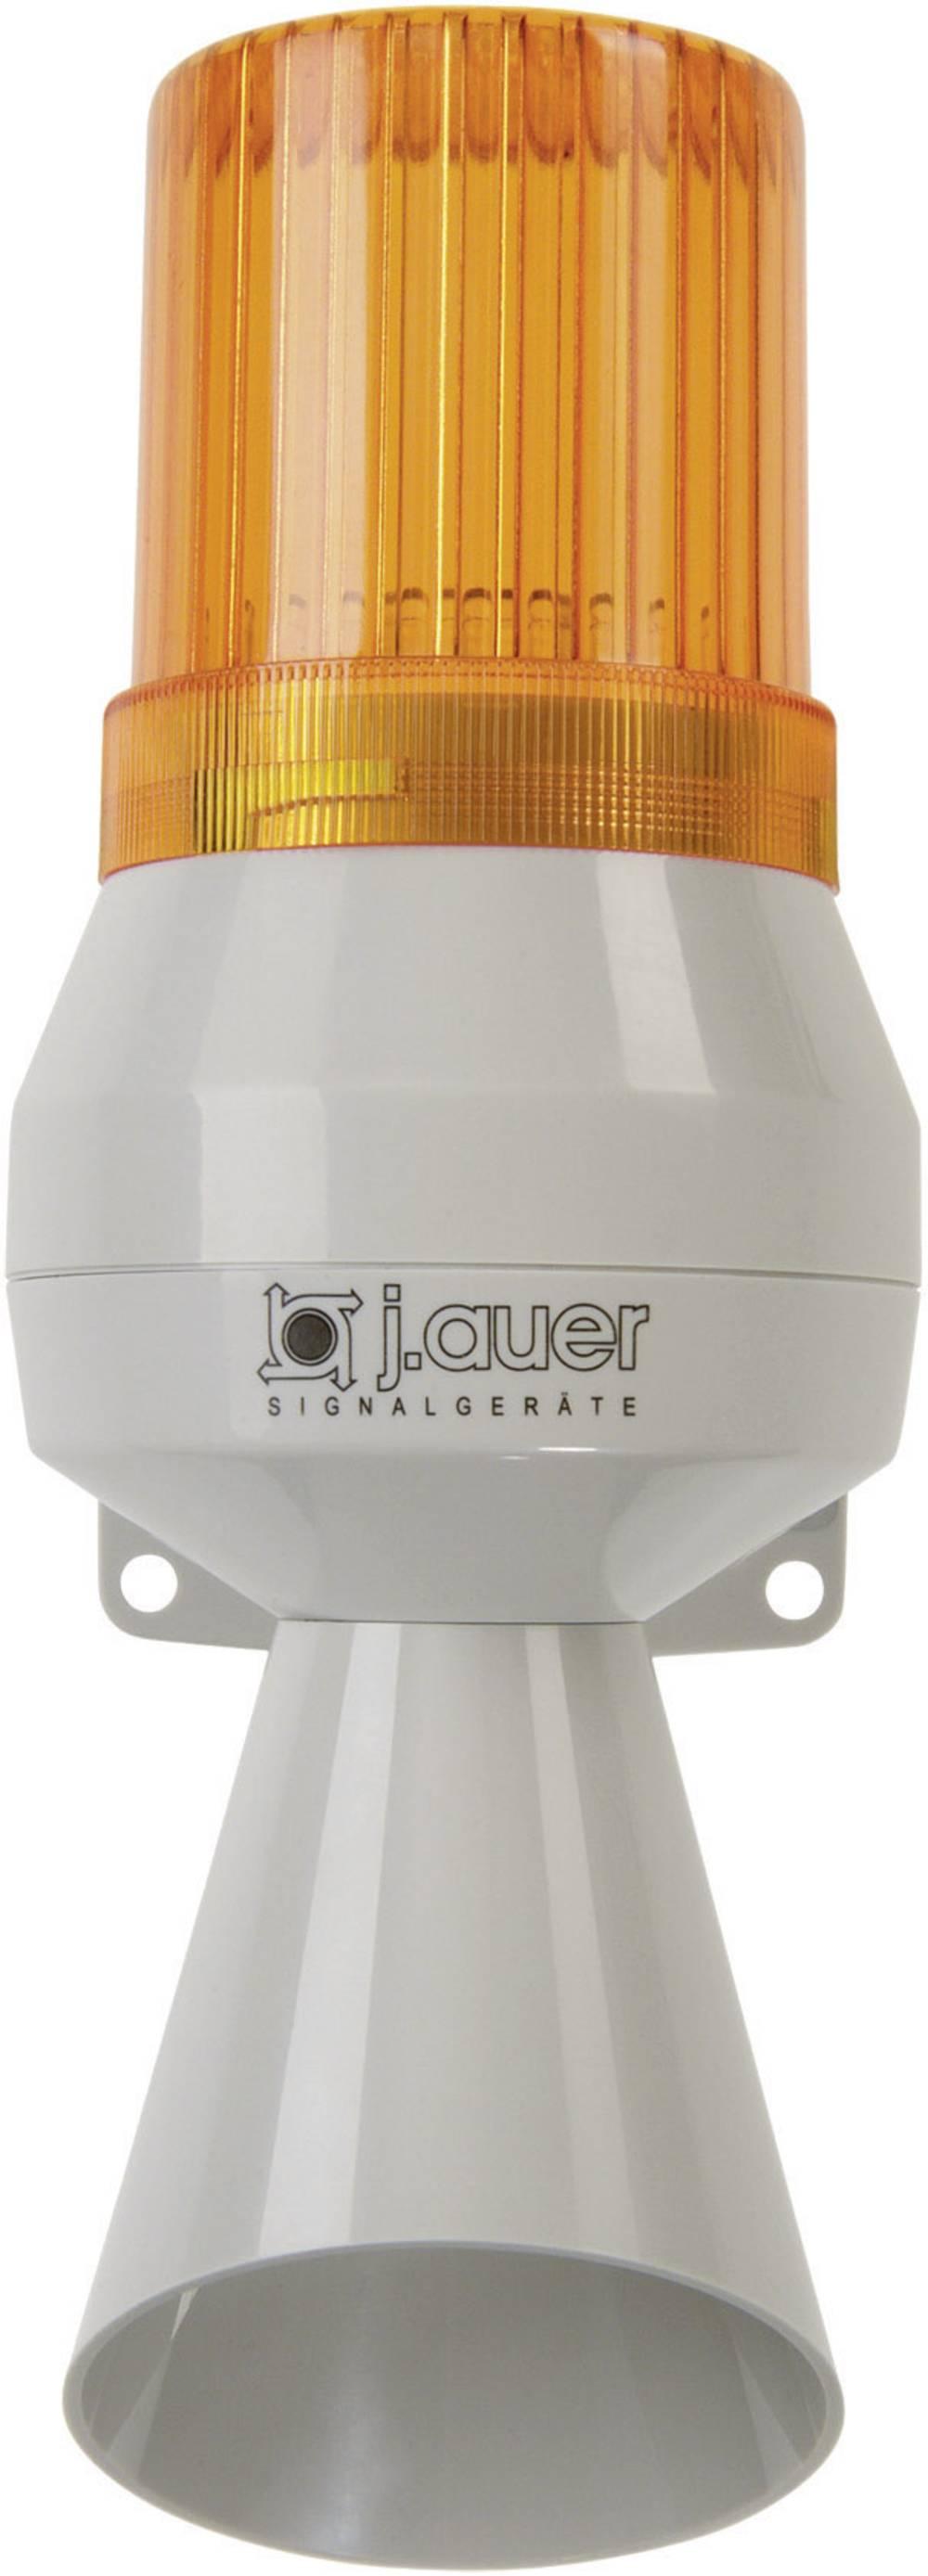 Kombinirani oddajnik signala Auer Signalgeräte KLL oranžna neprekinjena luč, neprekinjen ton 24 V/DC